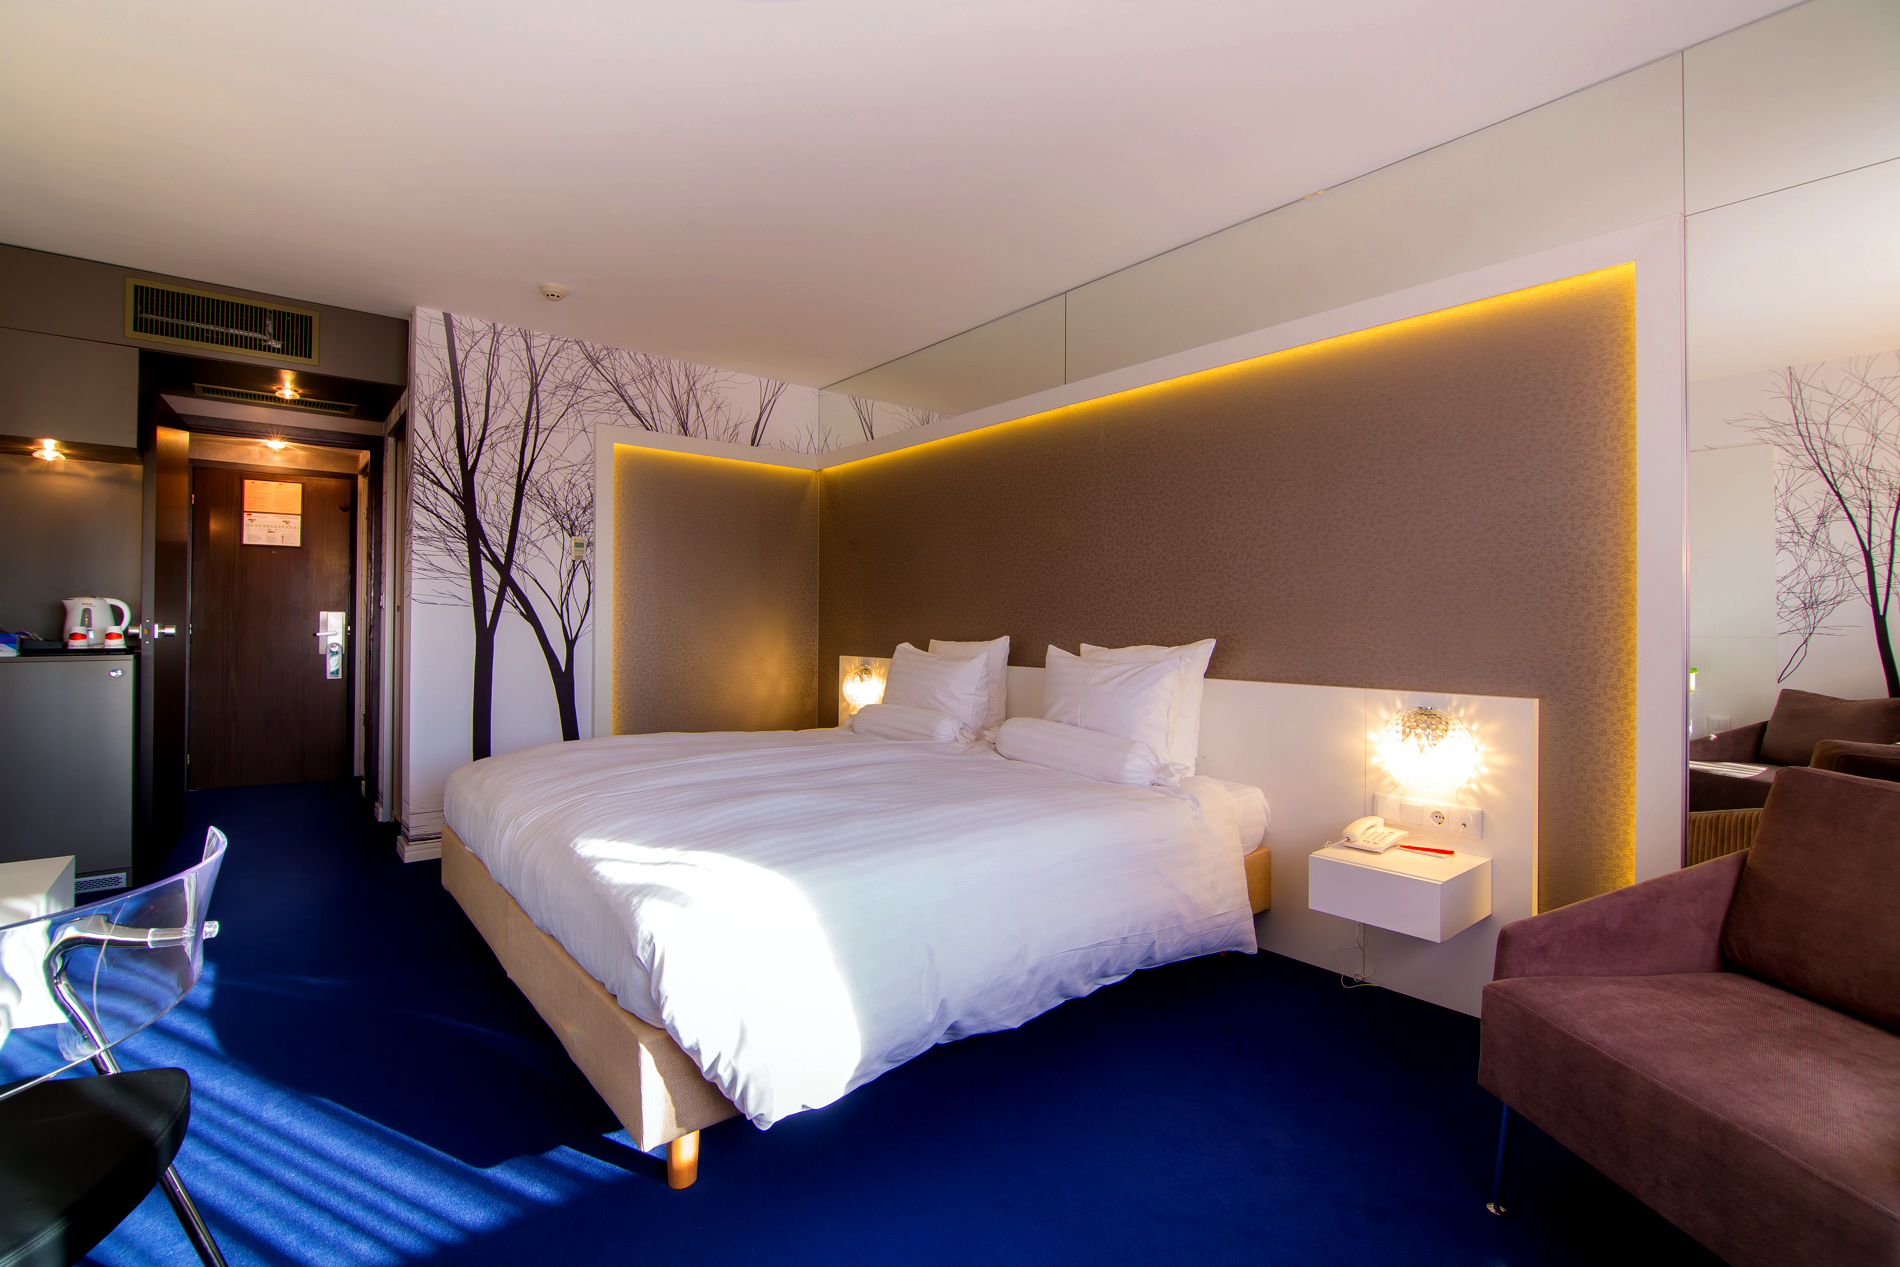 Grand_Hotel_Plovdiv_delux_room7